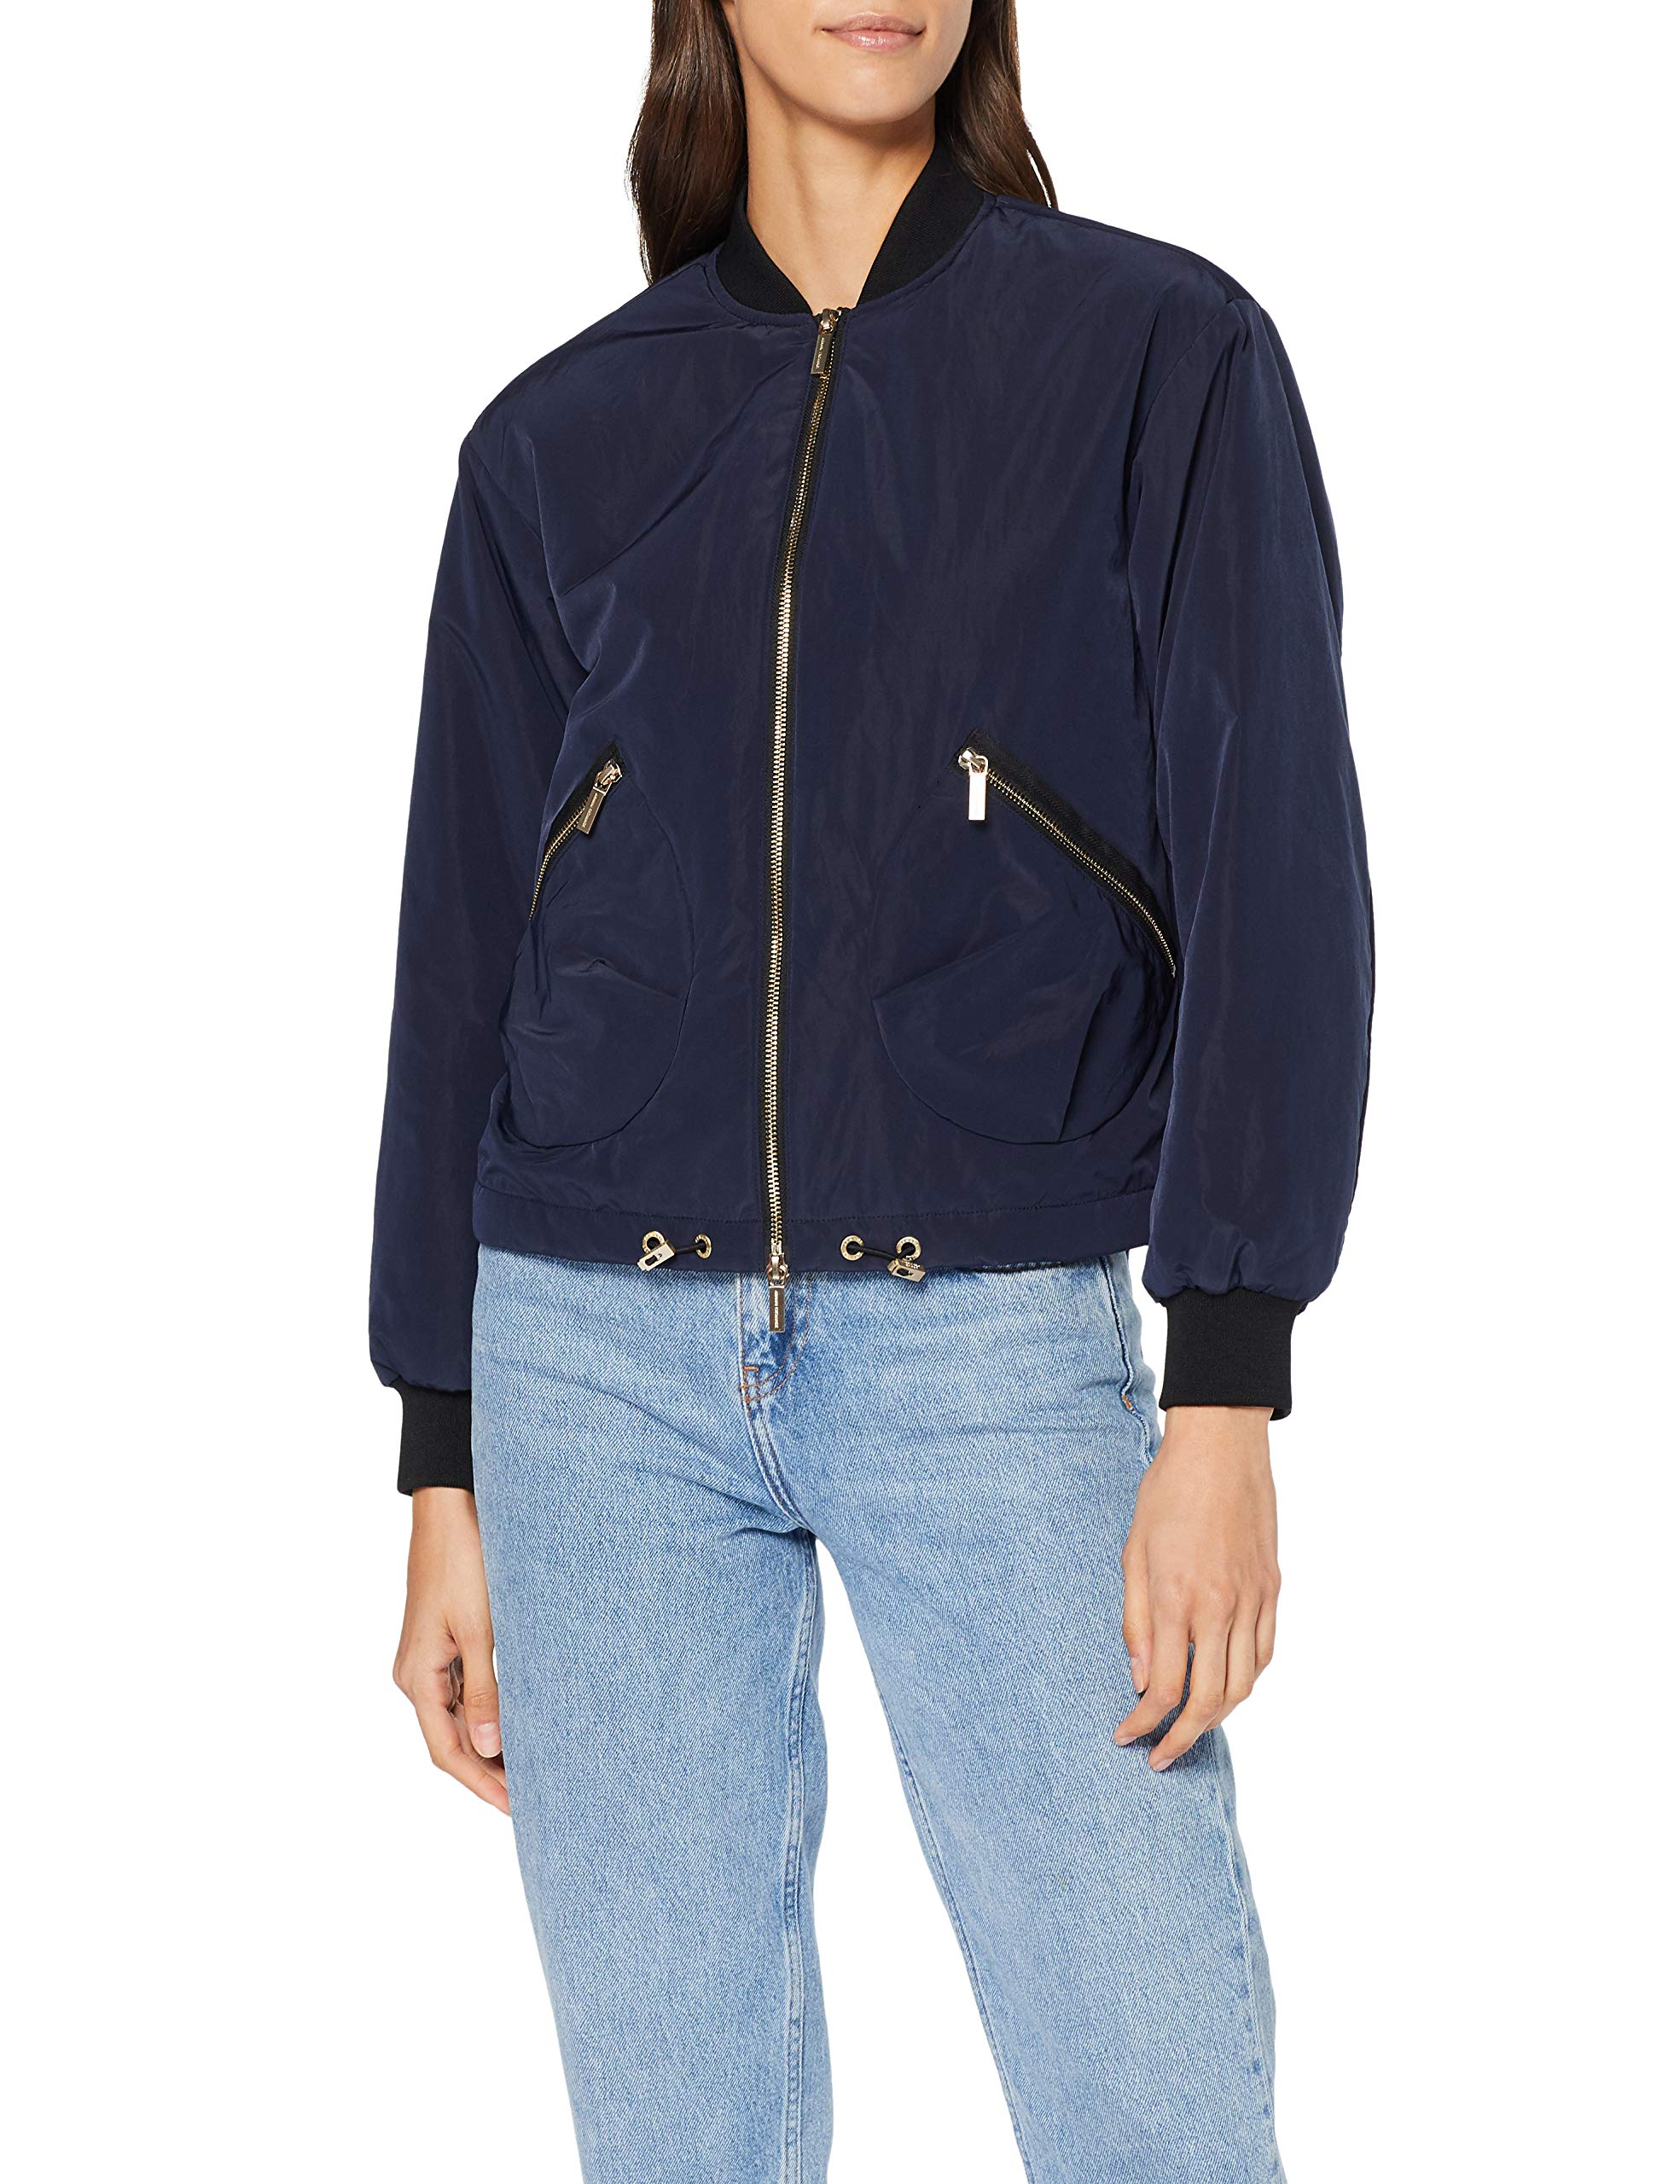 FemmeVioletblueberry Coat Style 1593Small Armani Bomber Exchange 90 Veste Jelly n0PkOw8X